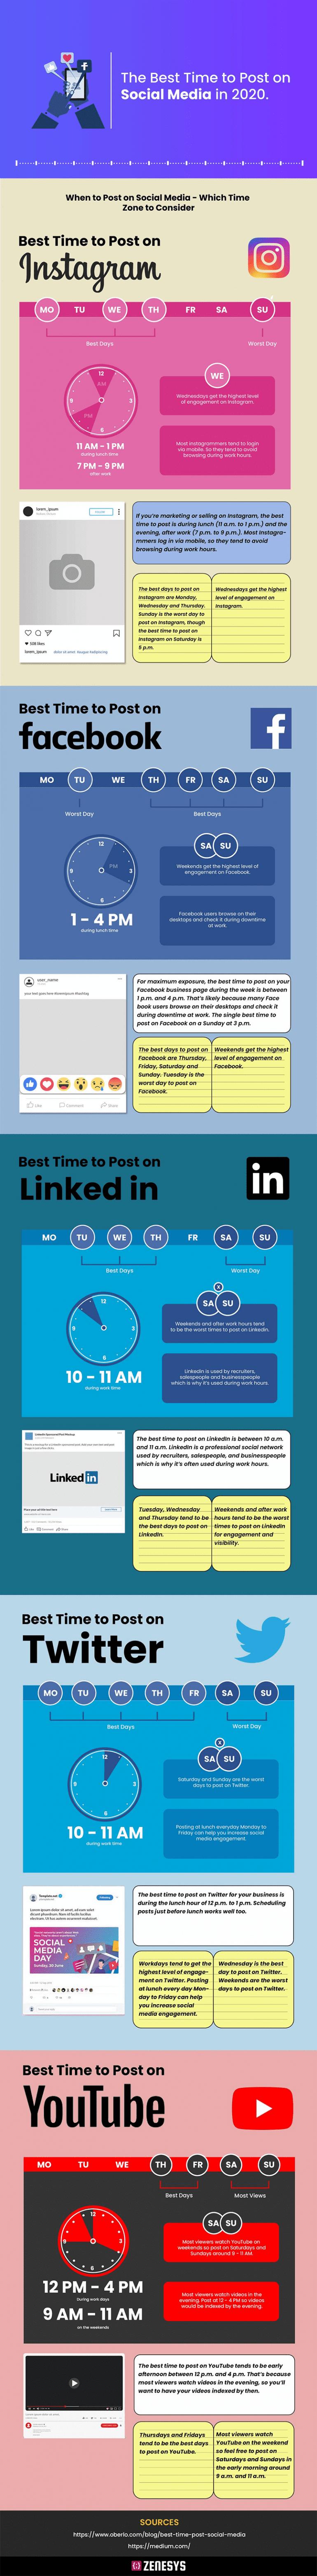 social media tijdstip